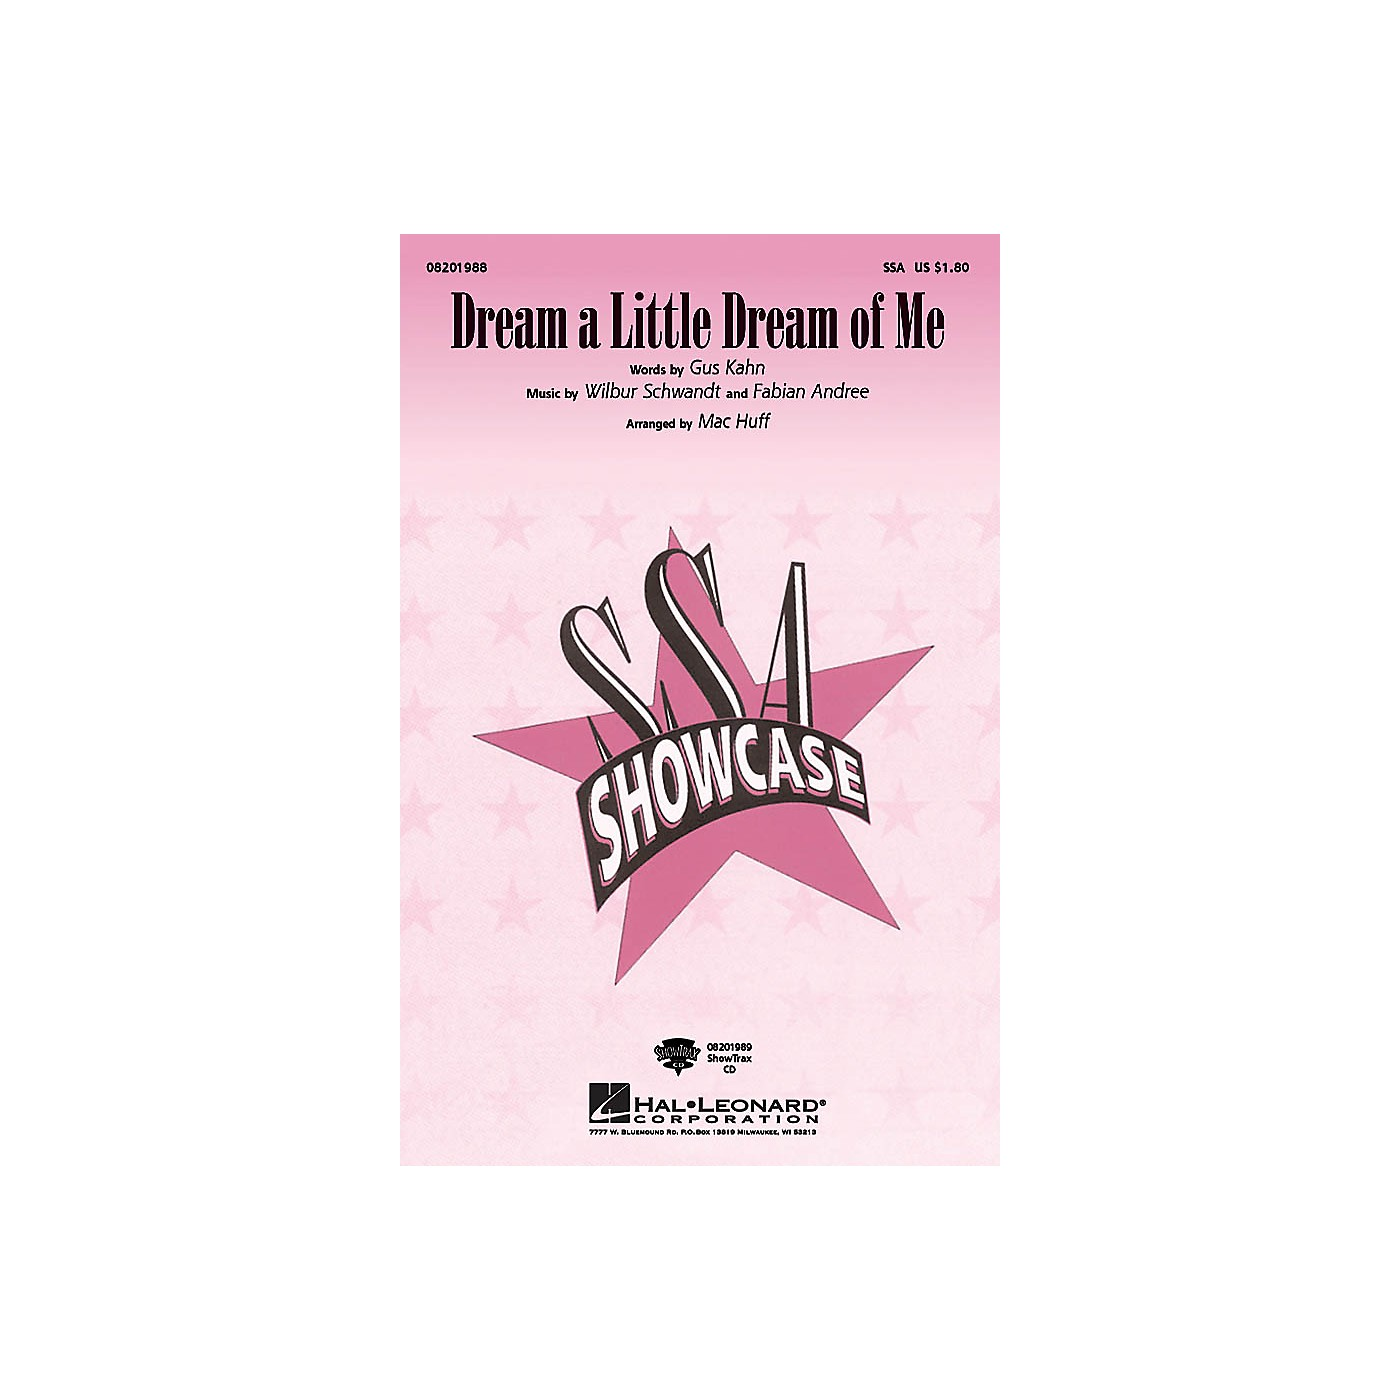 Hal Leonard Dream a Little Dream of Me ShowTrax CD Arranged by Mac Huff thumbnail